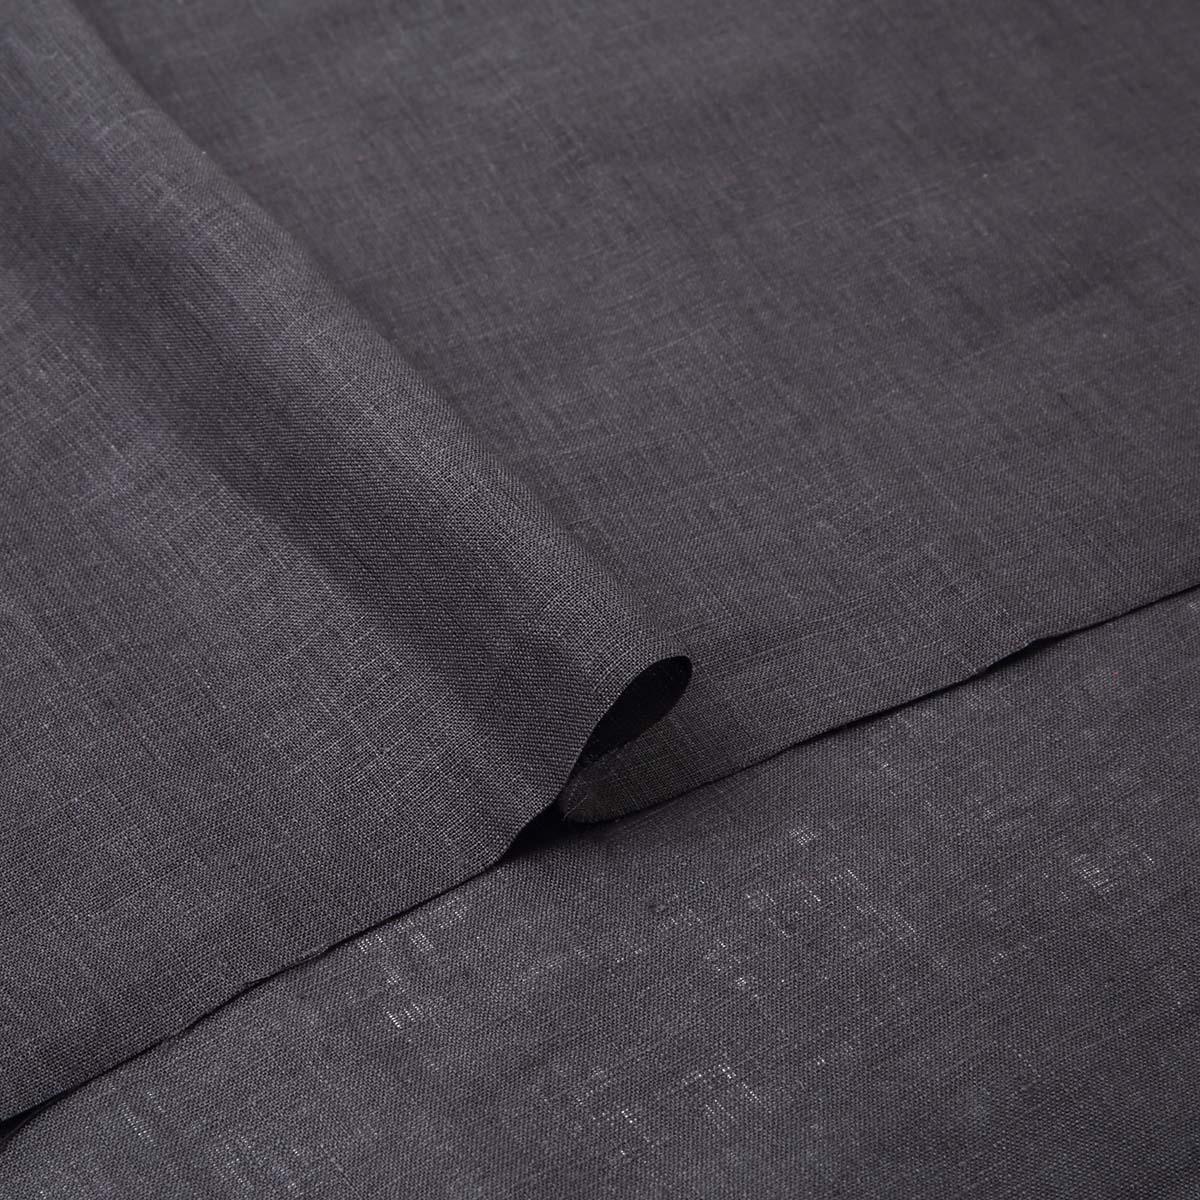 150cm巾【 リネン 100%生地 】 ブラック 薄地 1m単位 R0078-209【シャツ、スカート、ワンピースに最適】